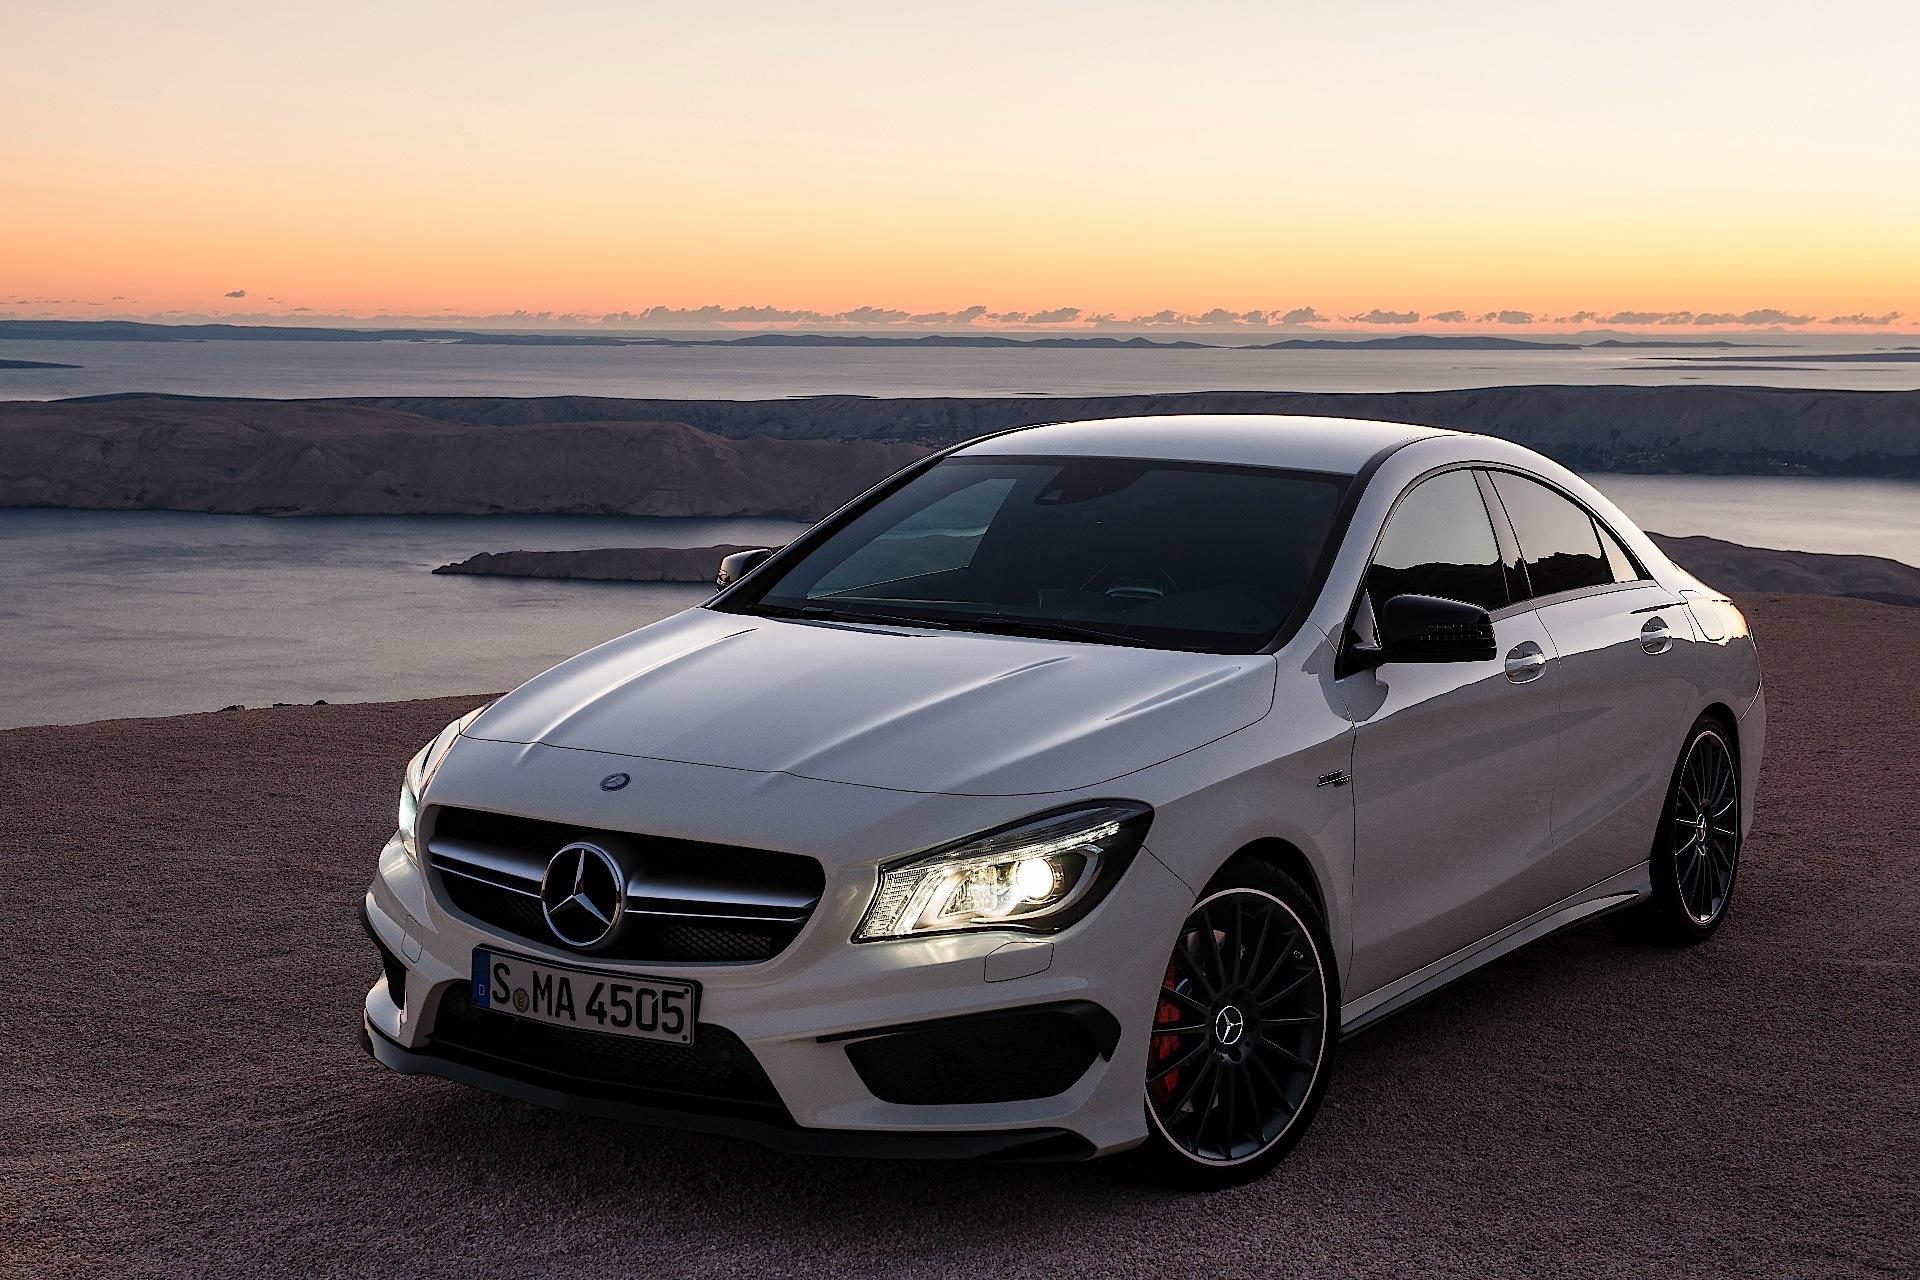 Mercedes benz cla 45 c117 specs 2013 2014 2015 2016 for Mercedes benz cla 2013